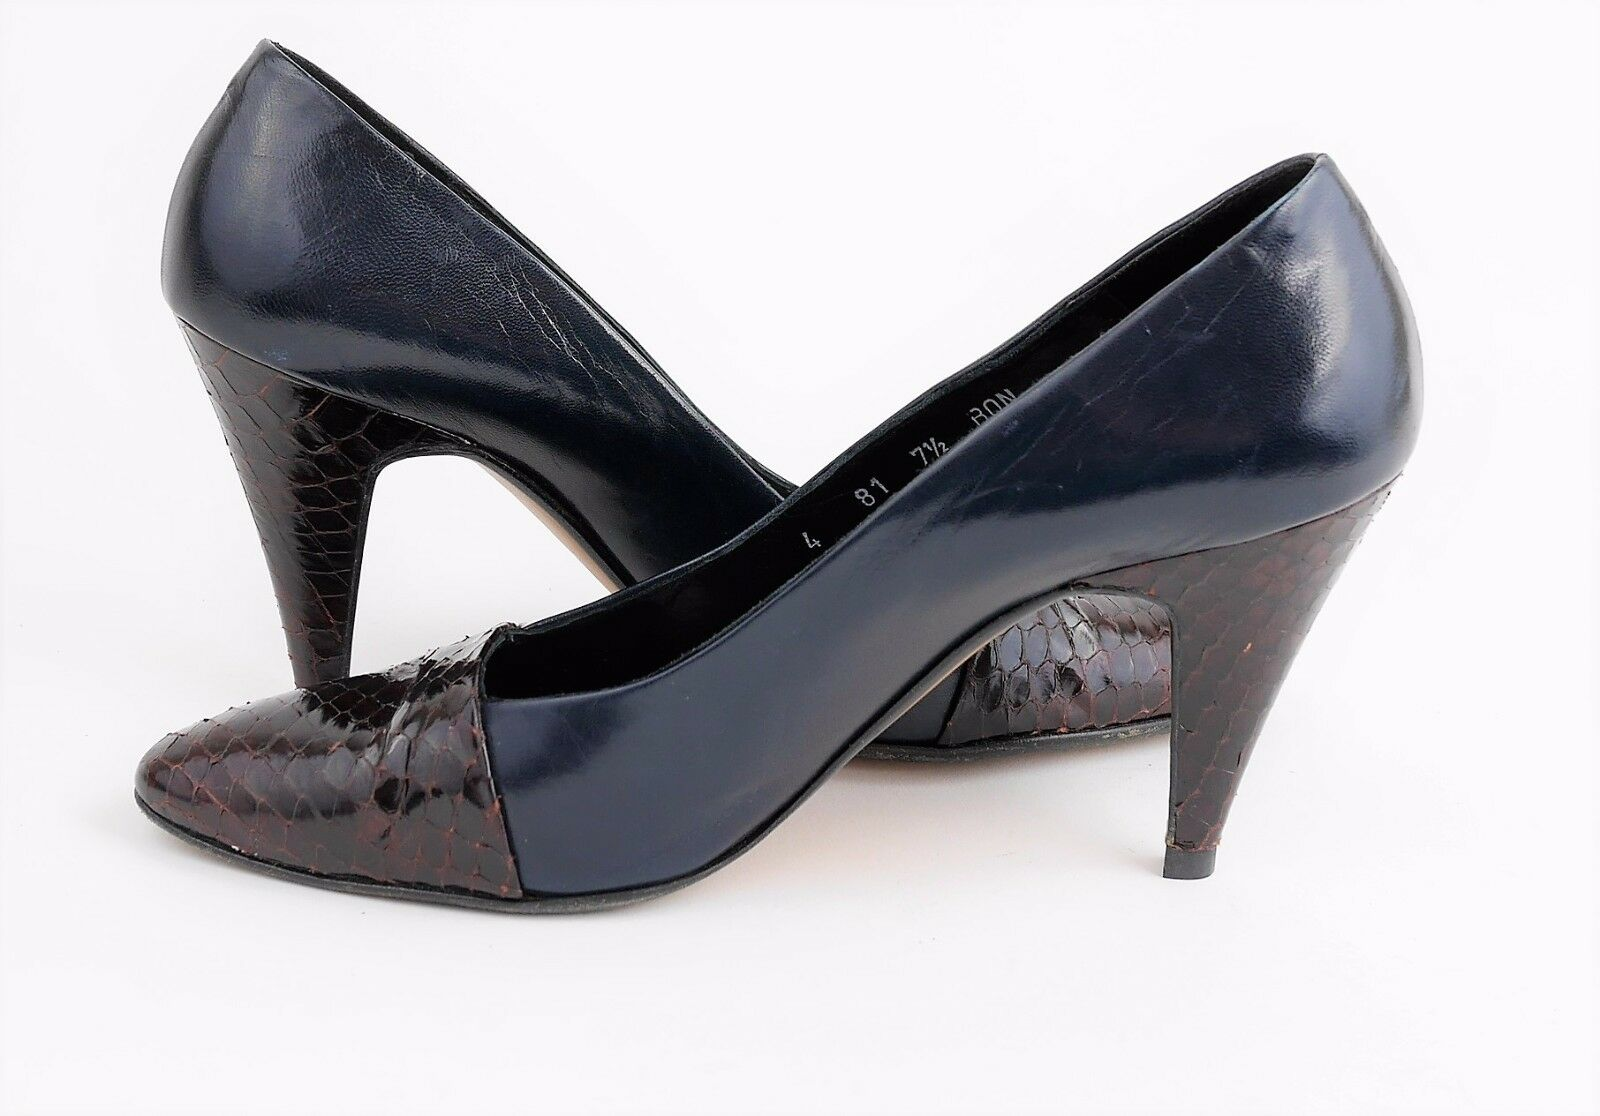 PANCALDI Snakeskin NEIMAN-MARCUS Navy Blau Leder Snakeskin PANCALDI High Heels Pumps  WOMEN'S 7.5 8d0fac